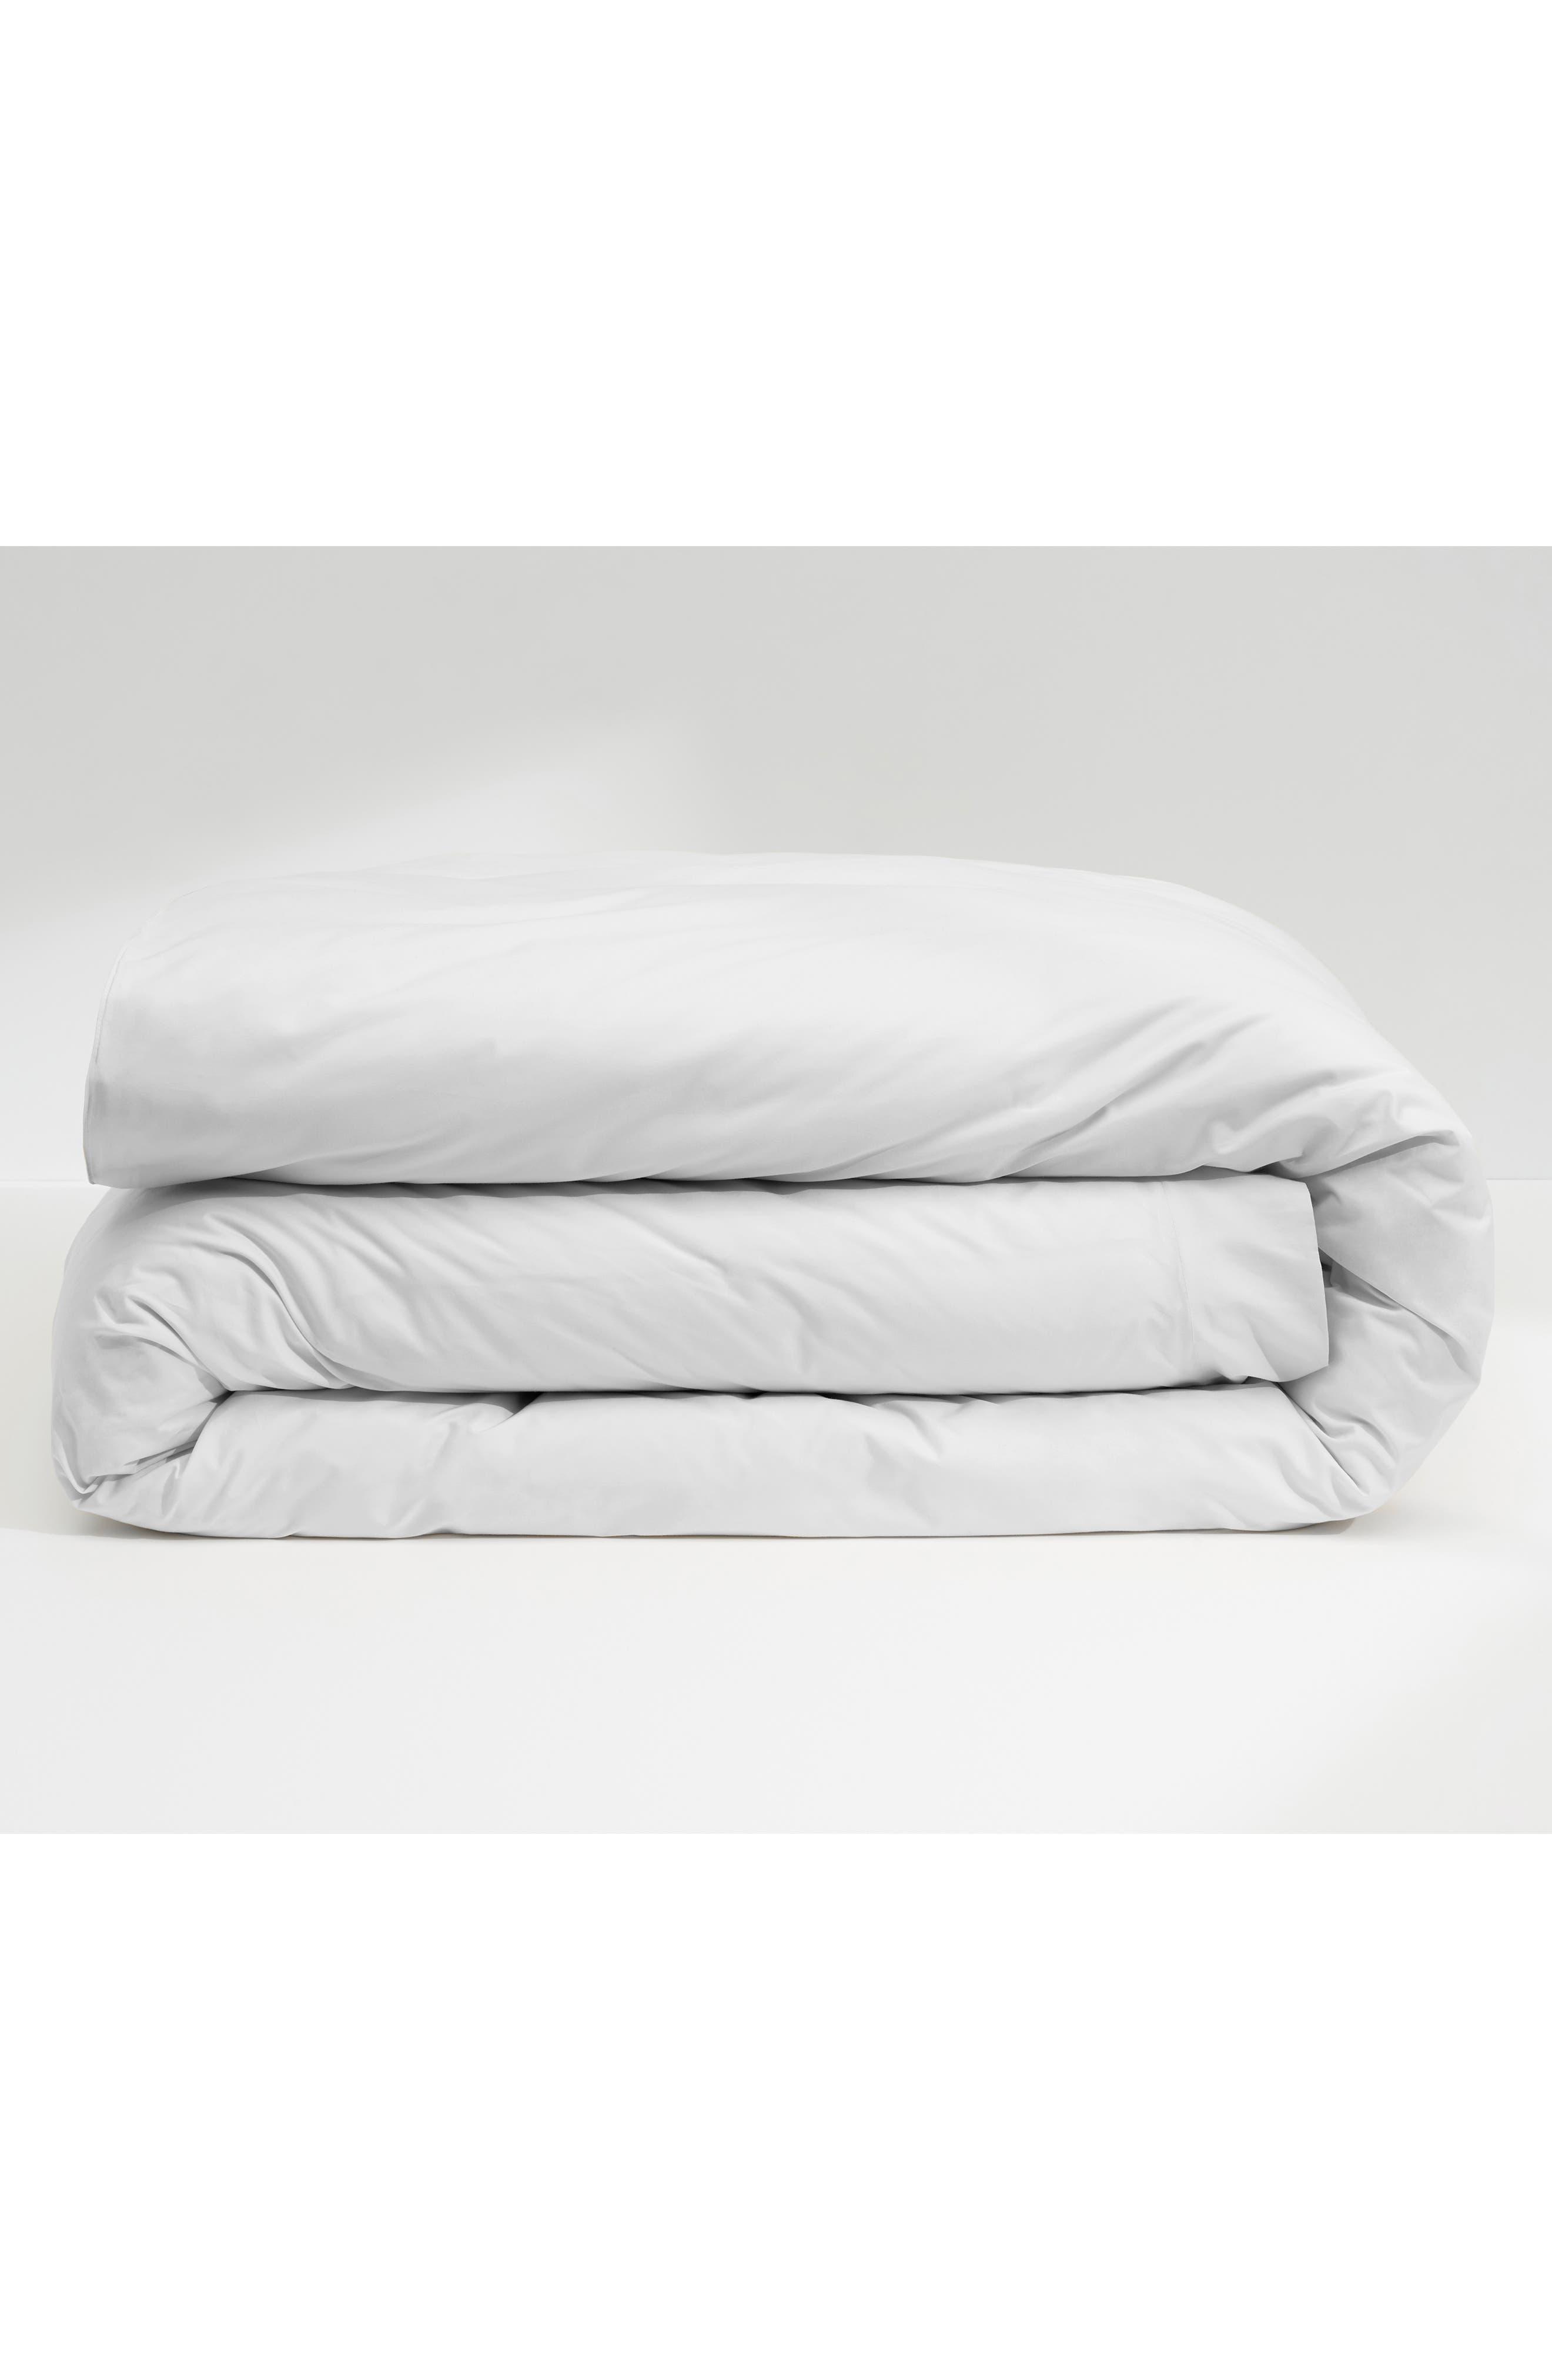 CASPER, The Supima 400 Thread Count Duvet Cover, Main thumbnail 1, color, WHITE